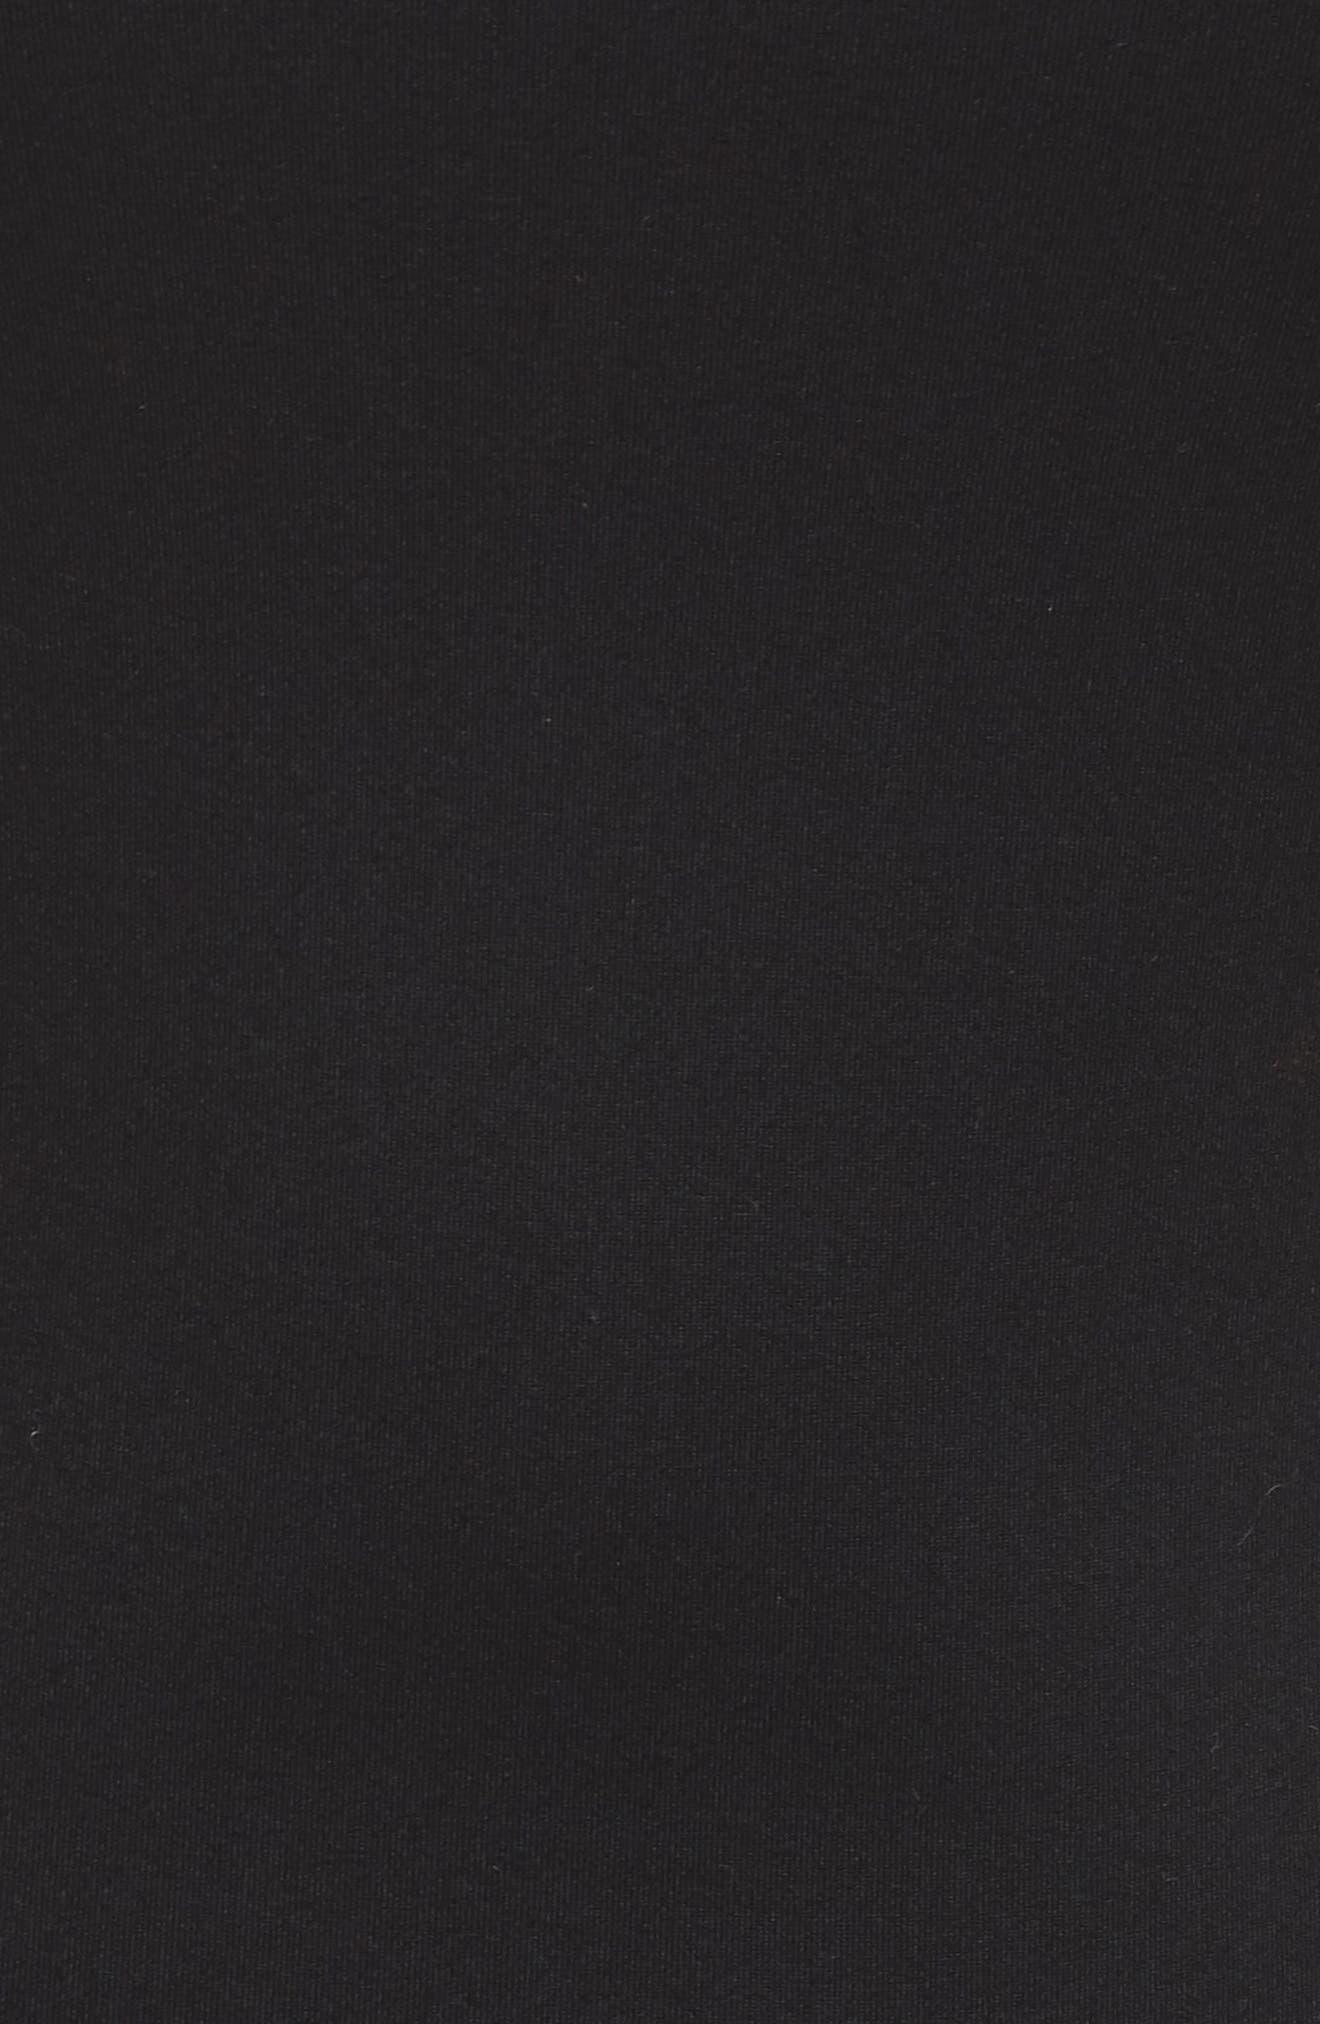 Body-Con Midi Dress,                             Alternate thumbnail 12, color,                             001